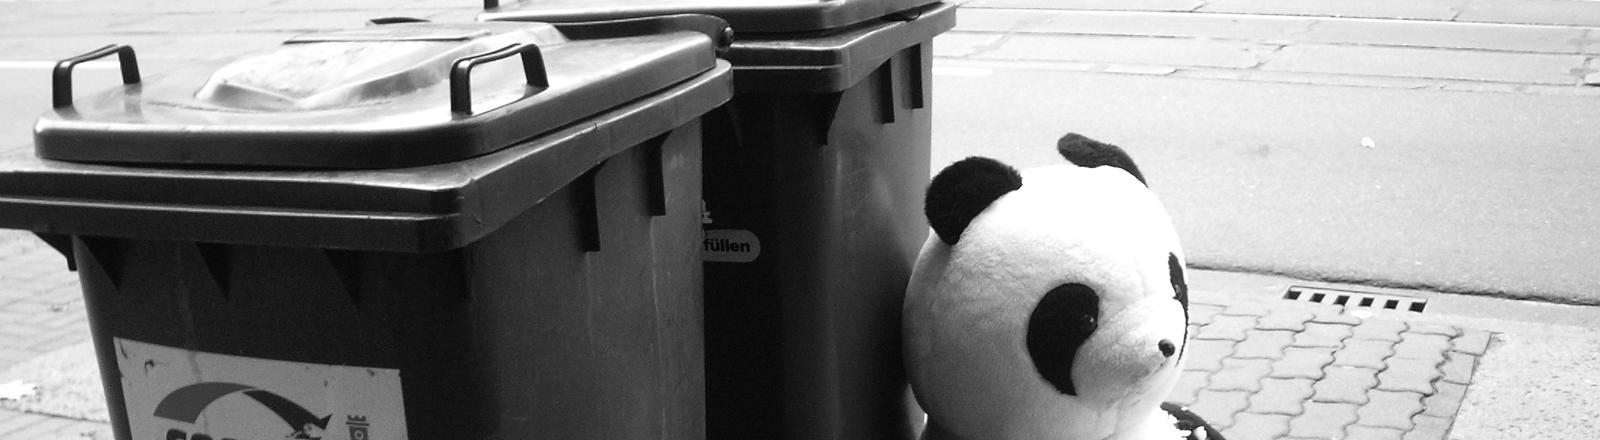 Panda Stofftier neben Mülltonnen.